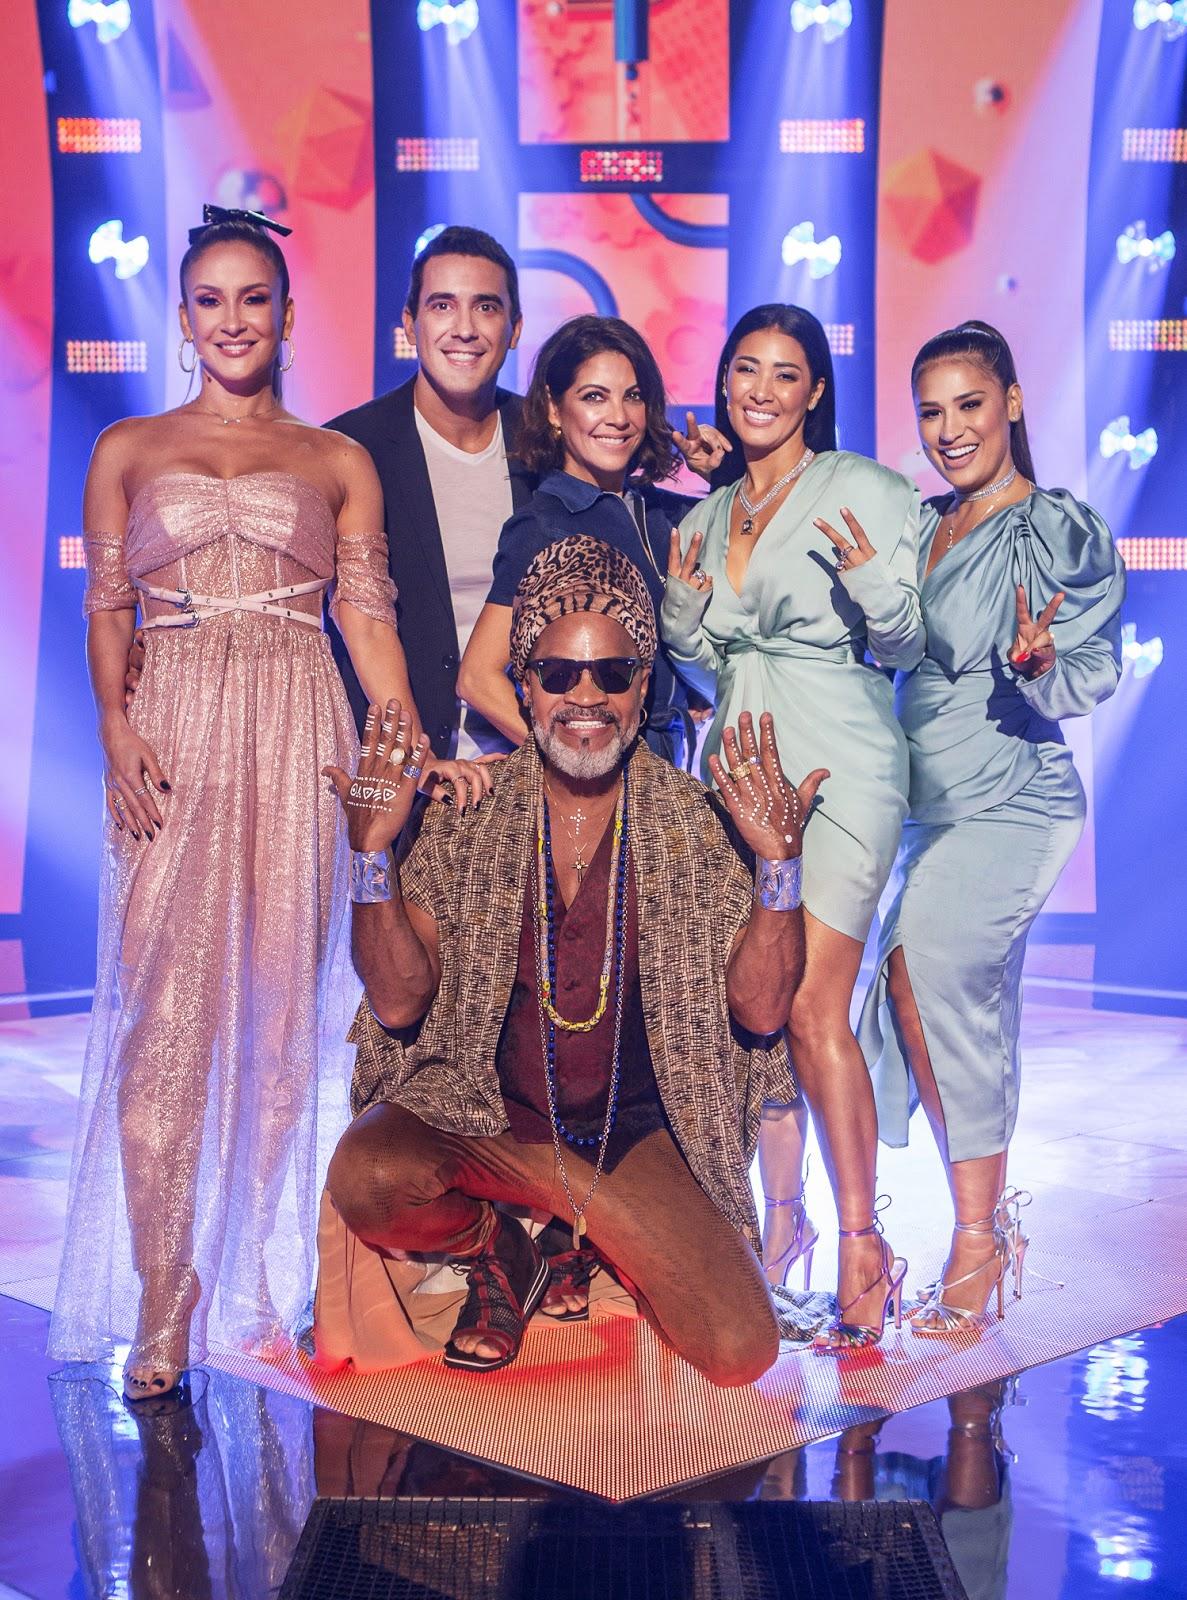 Morre Flavio Goldemberg Diretor Do The Voice Kids Da Globo